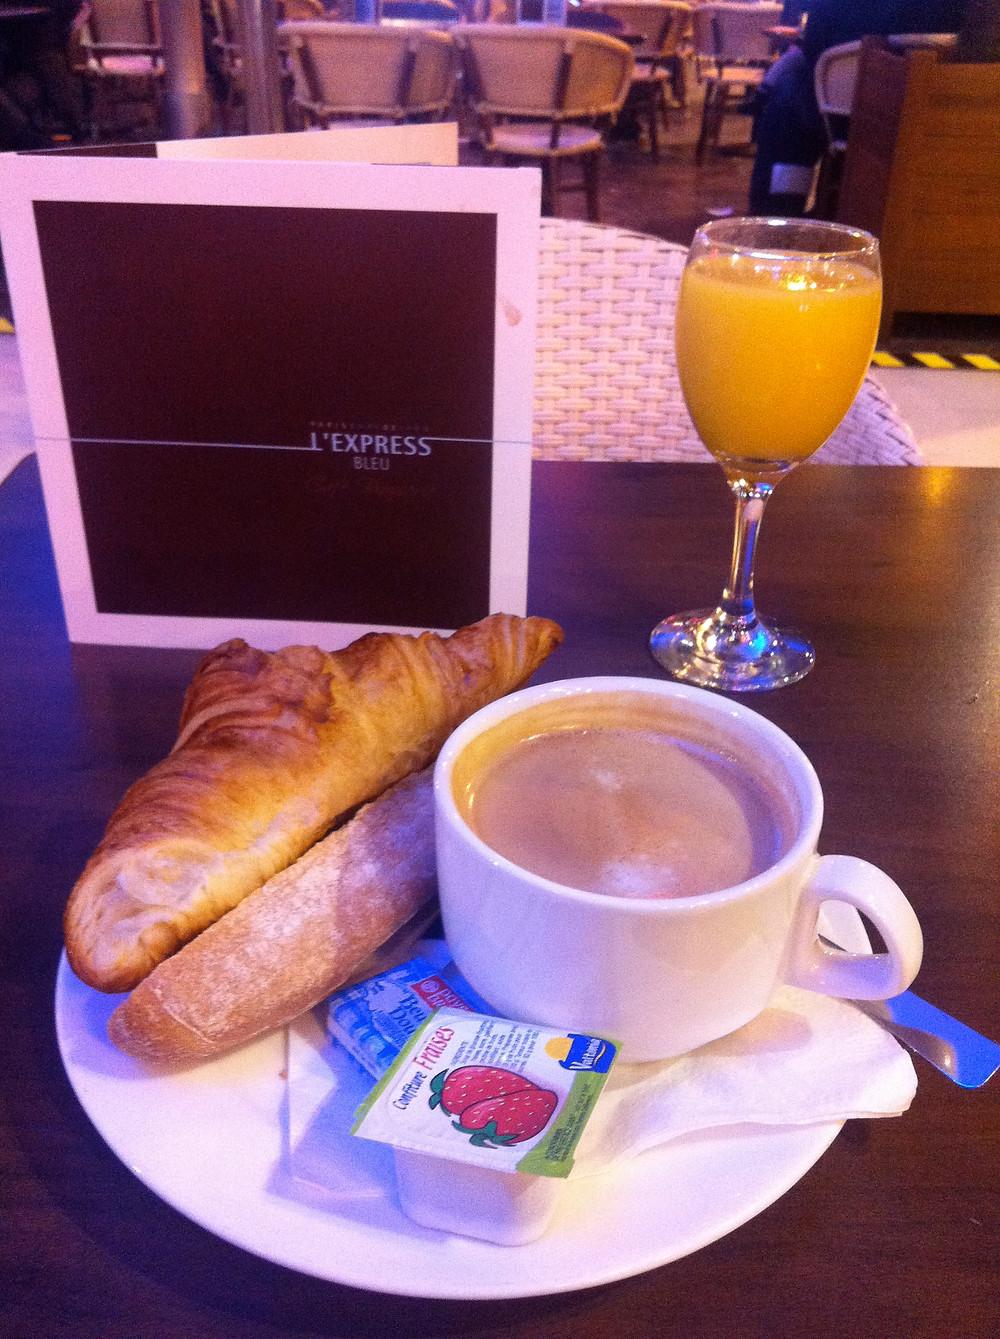 Typical breakfast in France - juice, vienoisserie, bread, jam  and café au lait